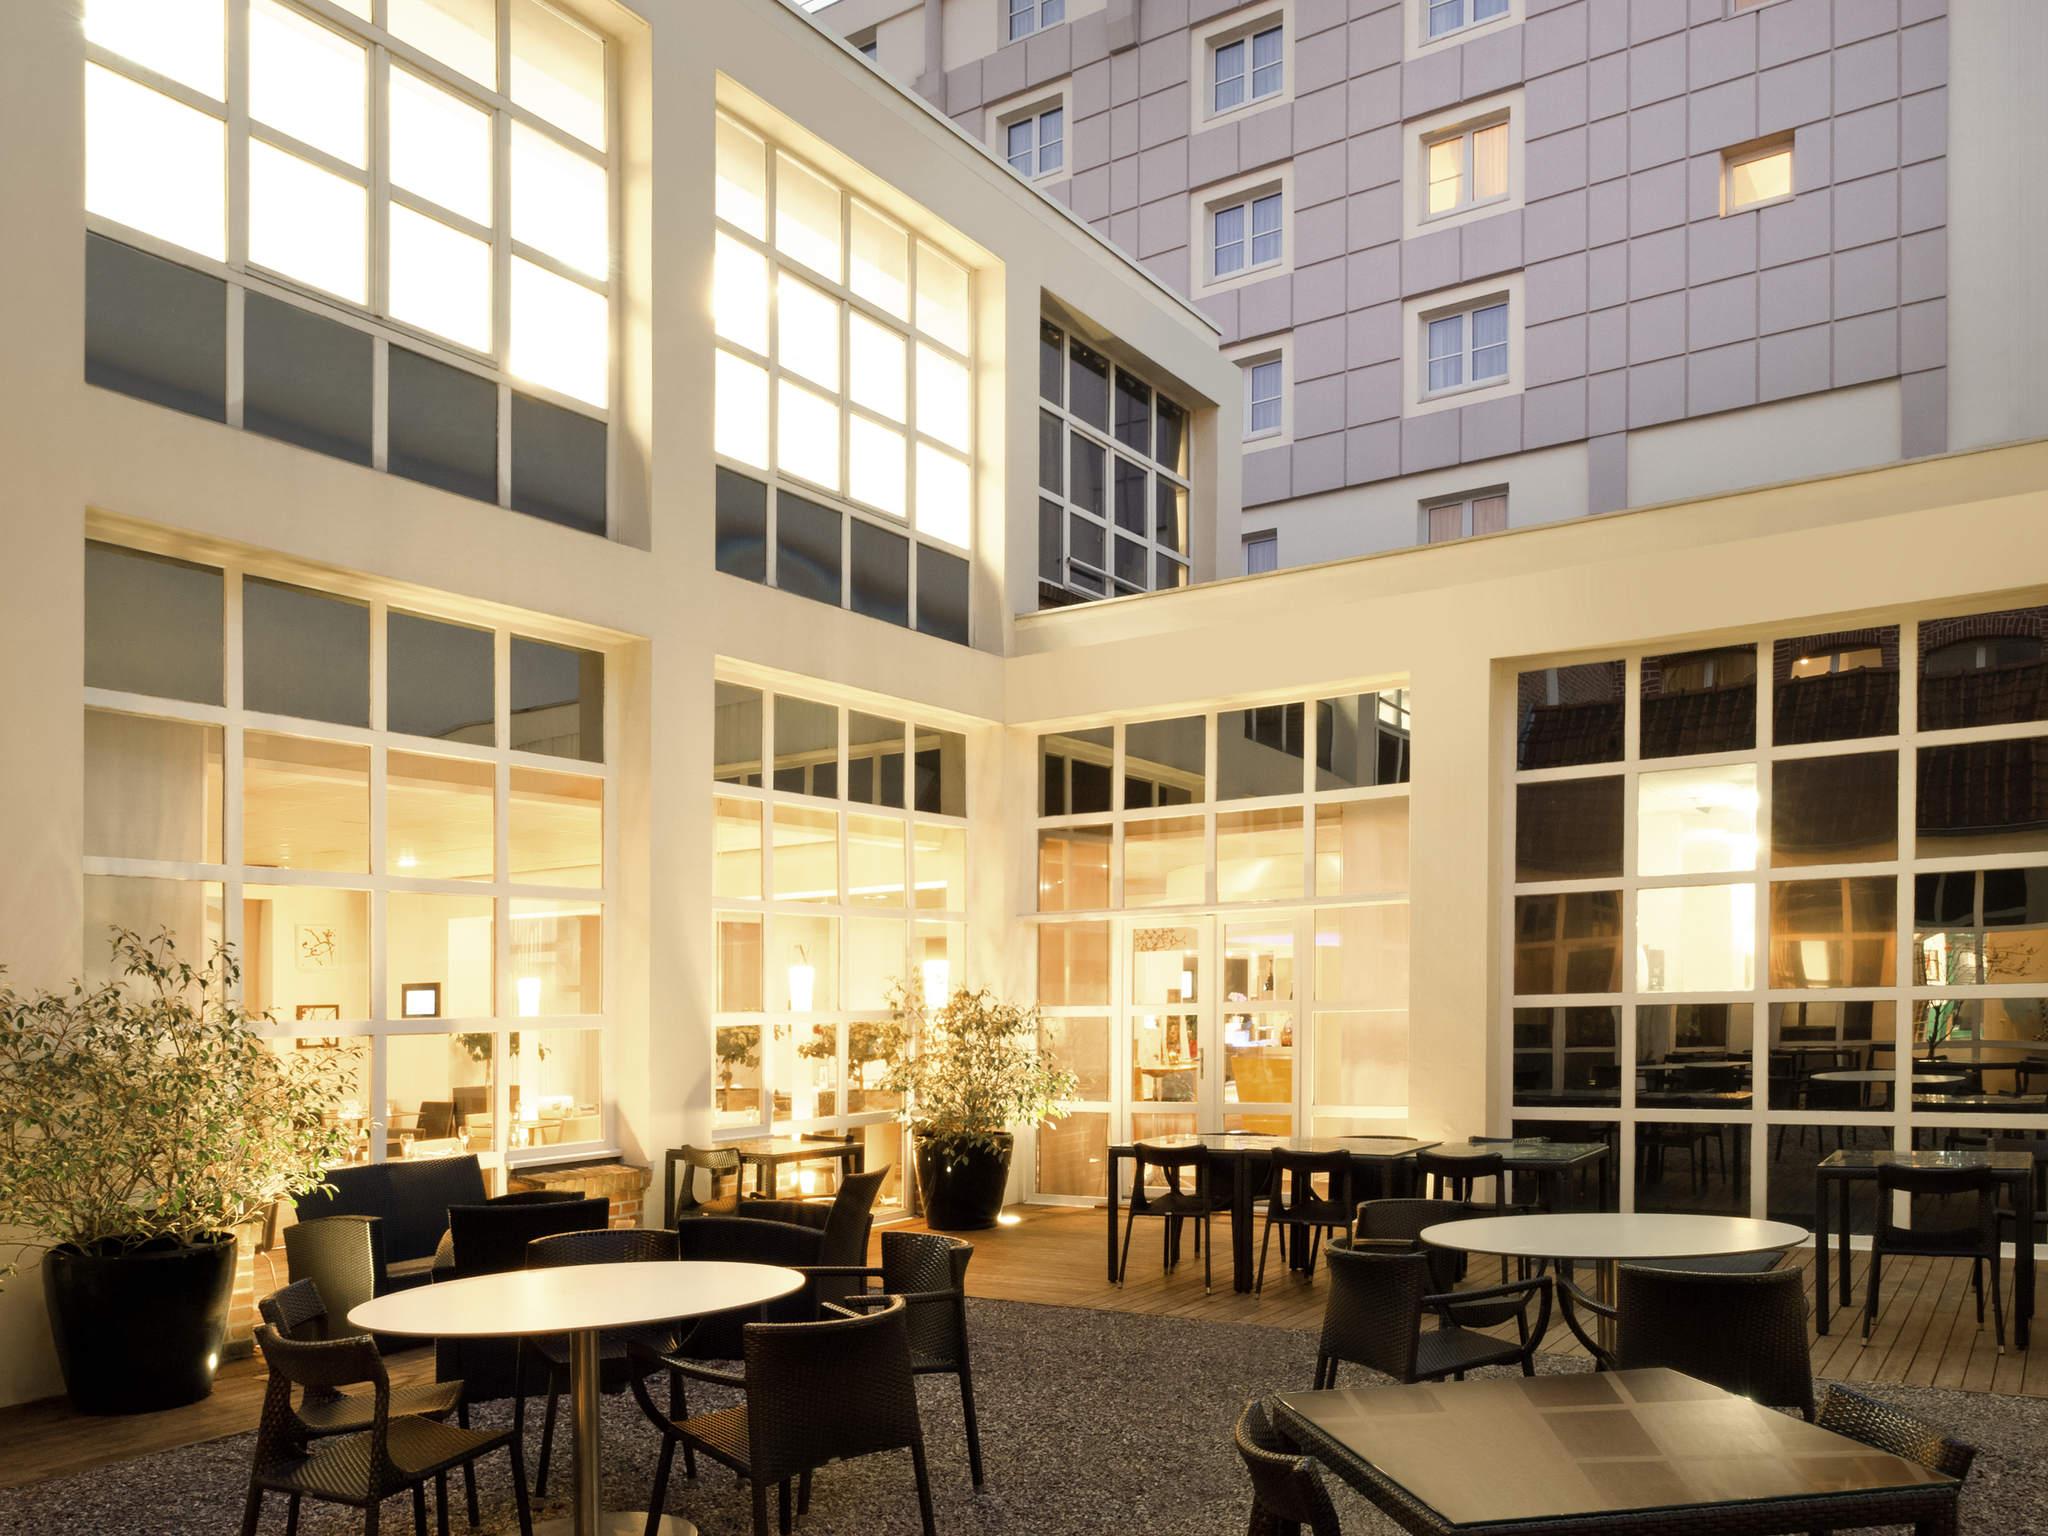 Hotel - Novotel Lille Centre Grand Place